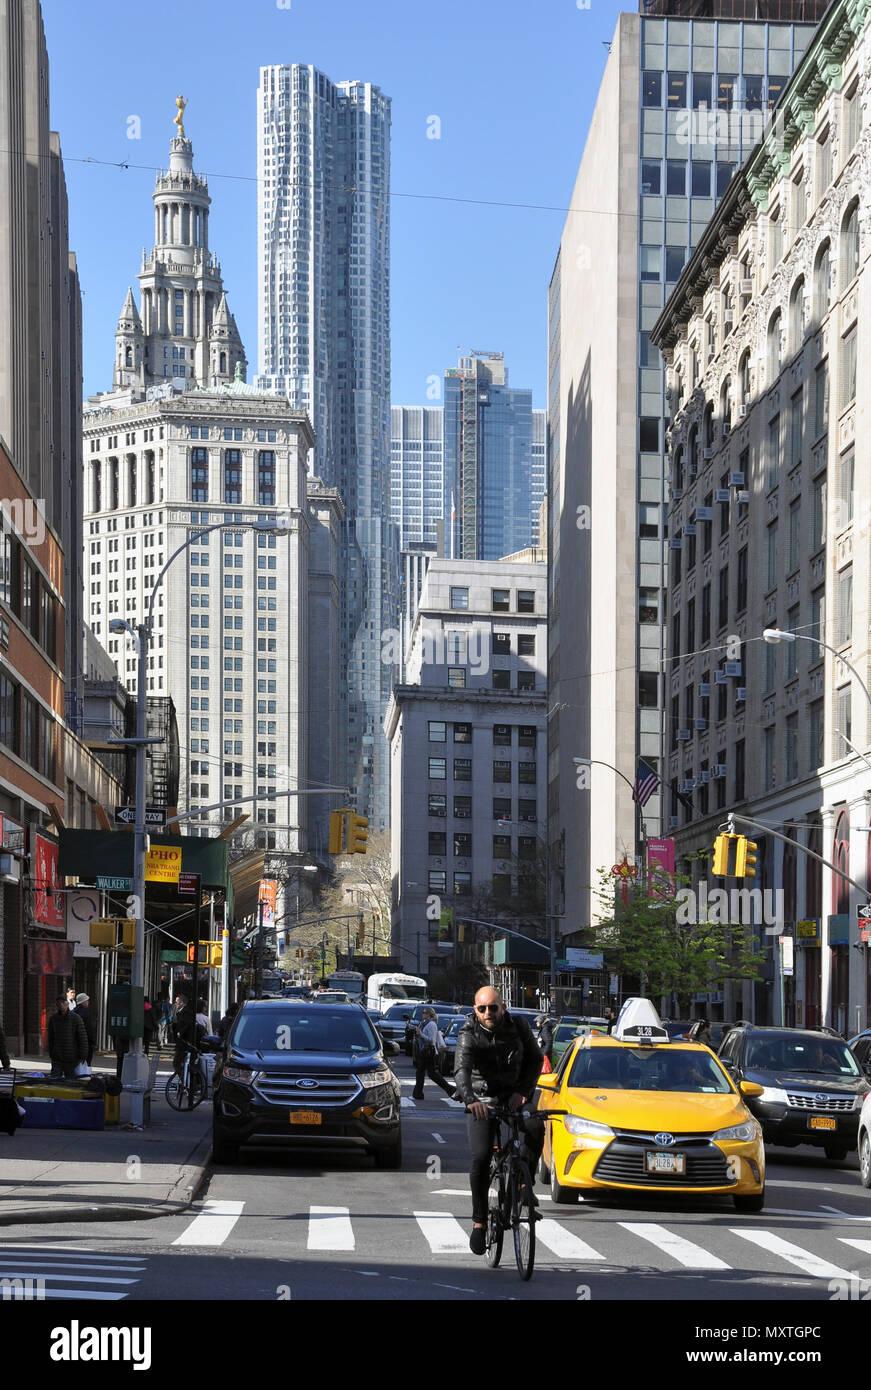 New York City streets, Manhattan, NYC - Stock Image